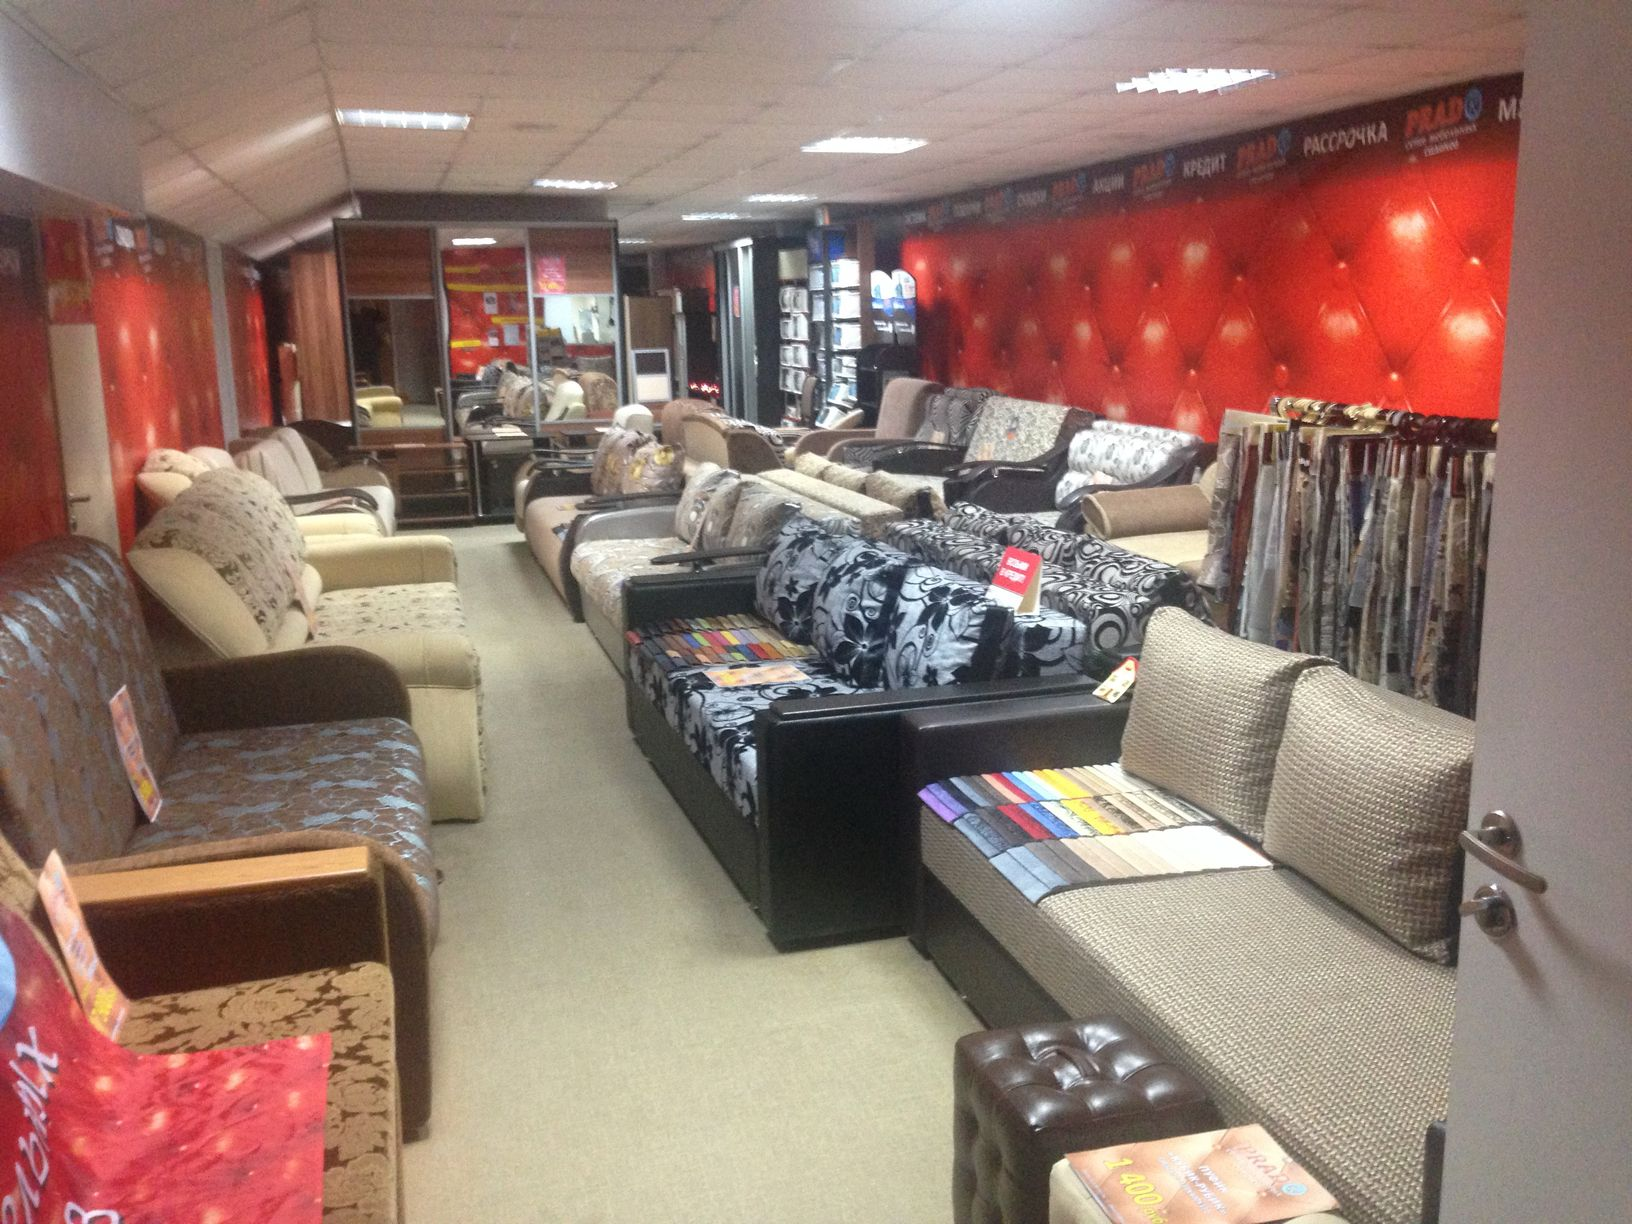 Салон 250 м2 мягкой и корусной мебели